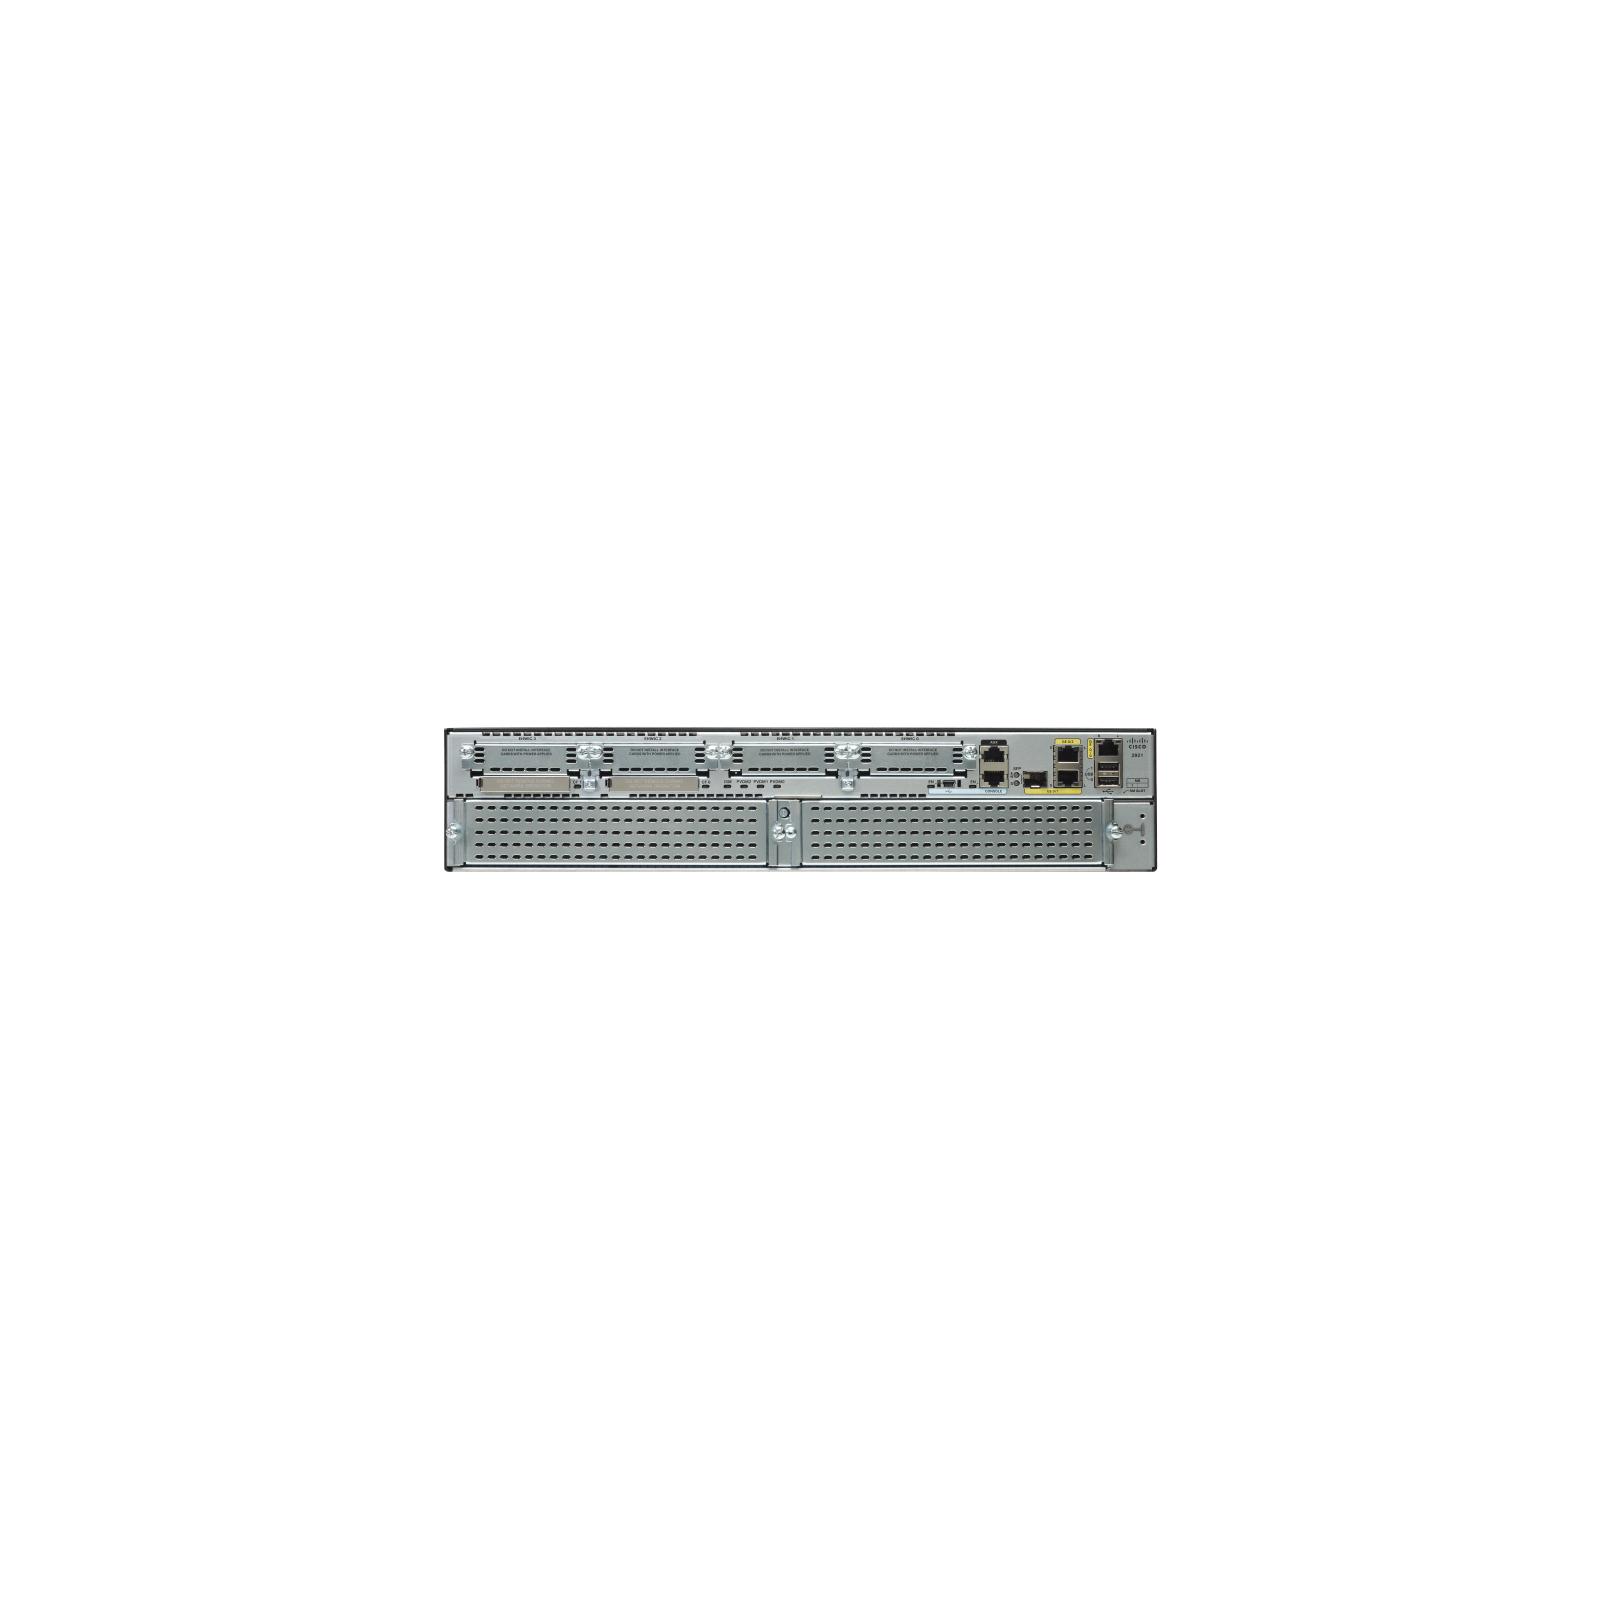 Маршрутизатор Cisco CISCO2921-SEC/K9 изображение 2